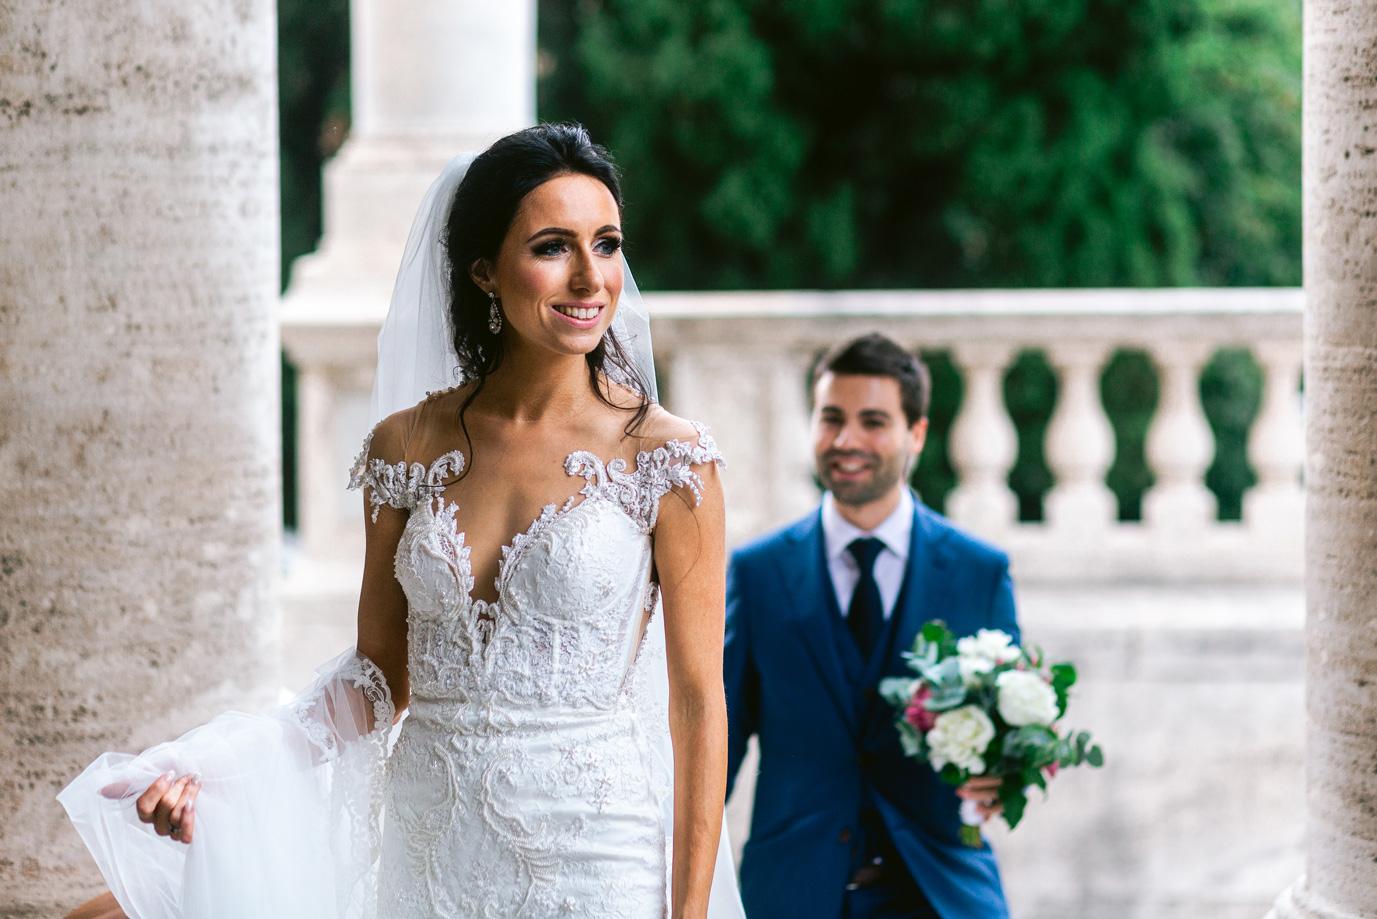 trouwen buitenland italie rome 2